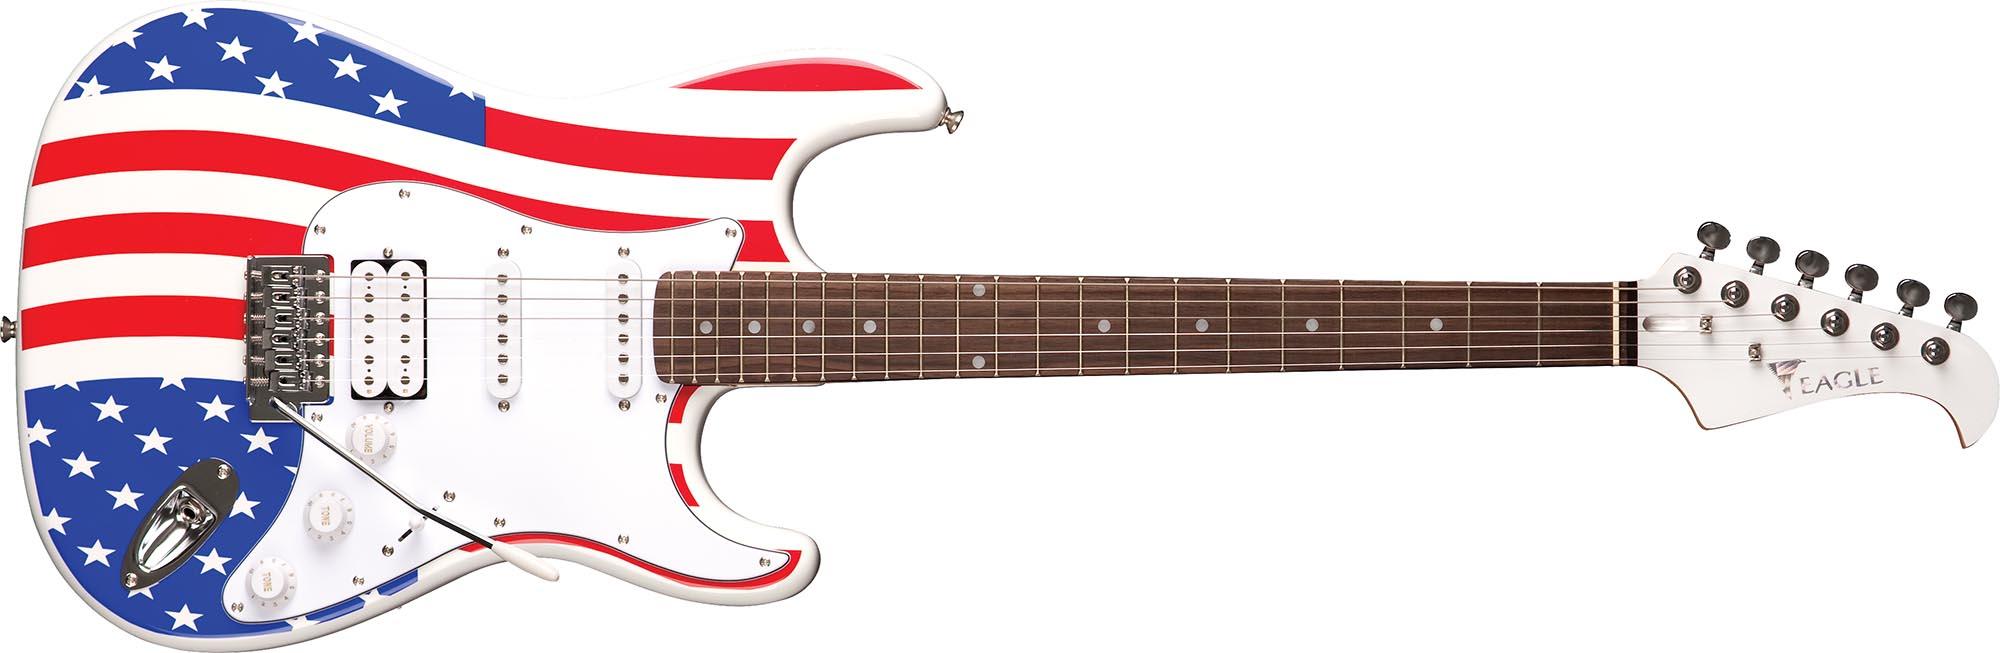 sts002 guitarra eletrica stratocaster captador humbucker eagle sts002 us bandeira americana visao frontal